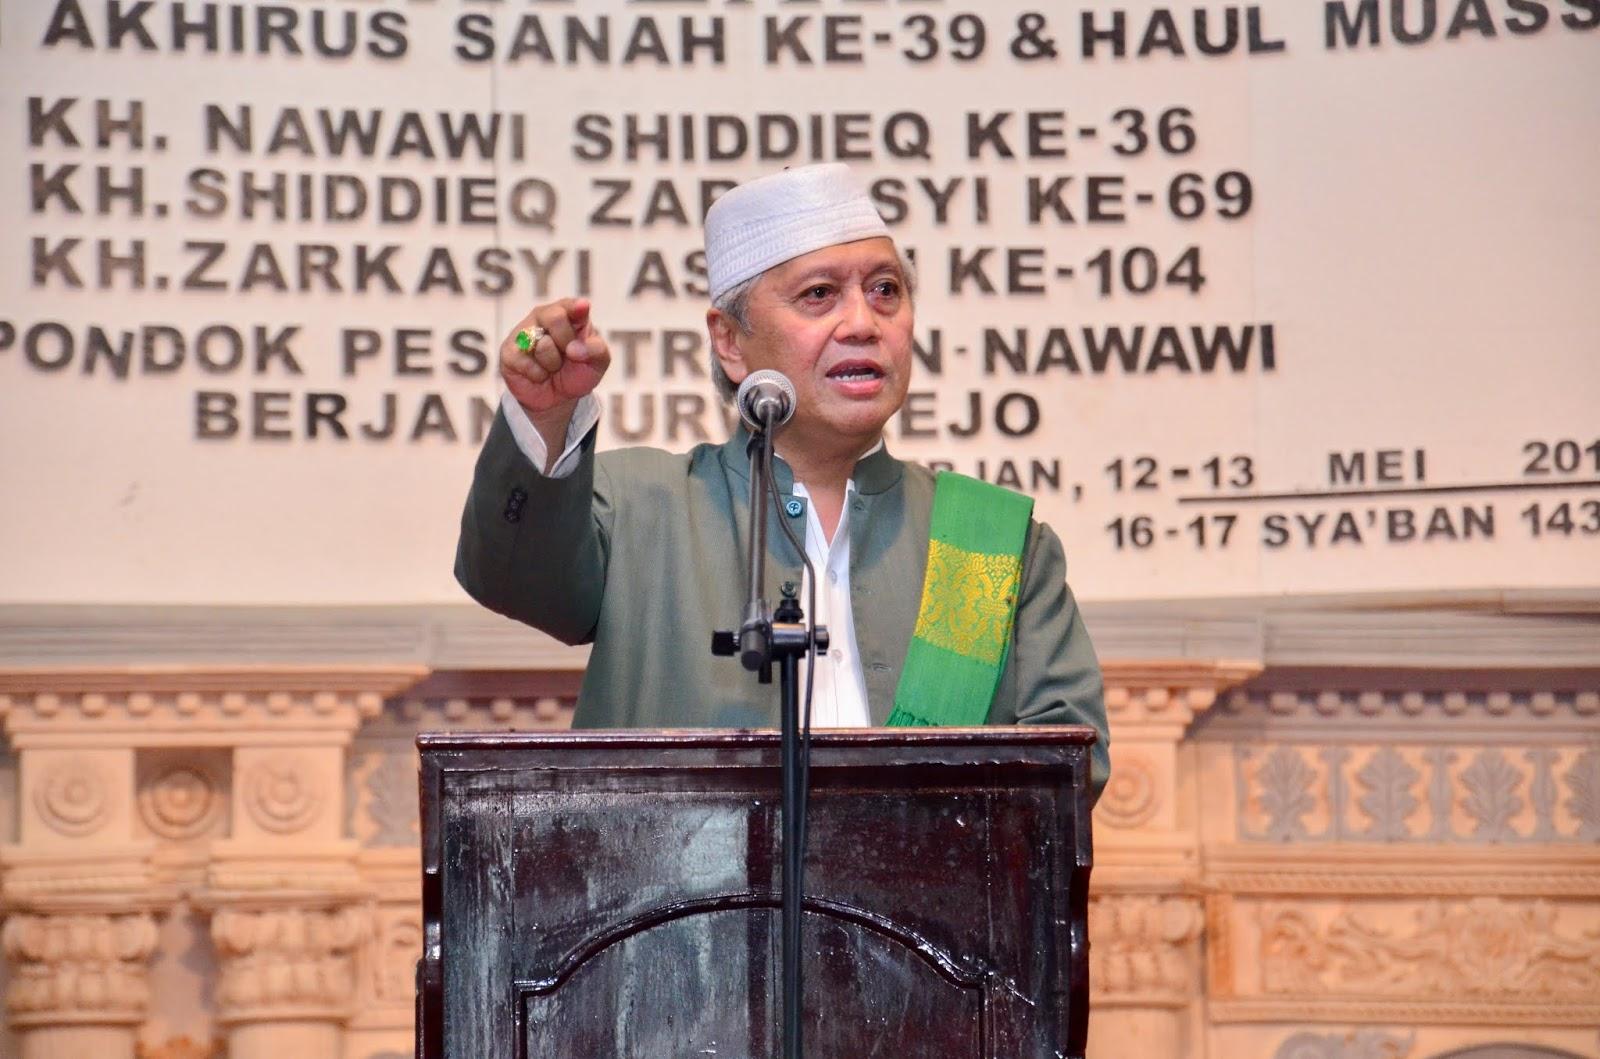 Uraian Hikmah Haul al-Mursyid al-Khalifah lit Thoriqah Qodiriyyah wa Naqsabandiyyah Berjan Purworejo